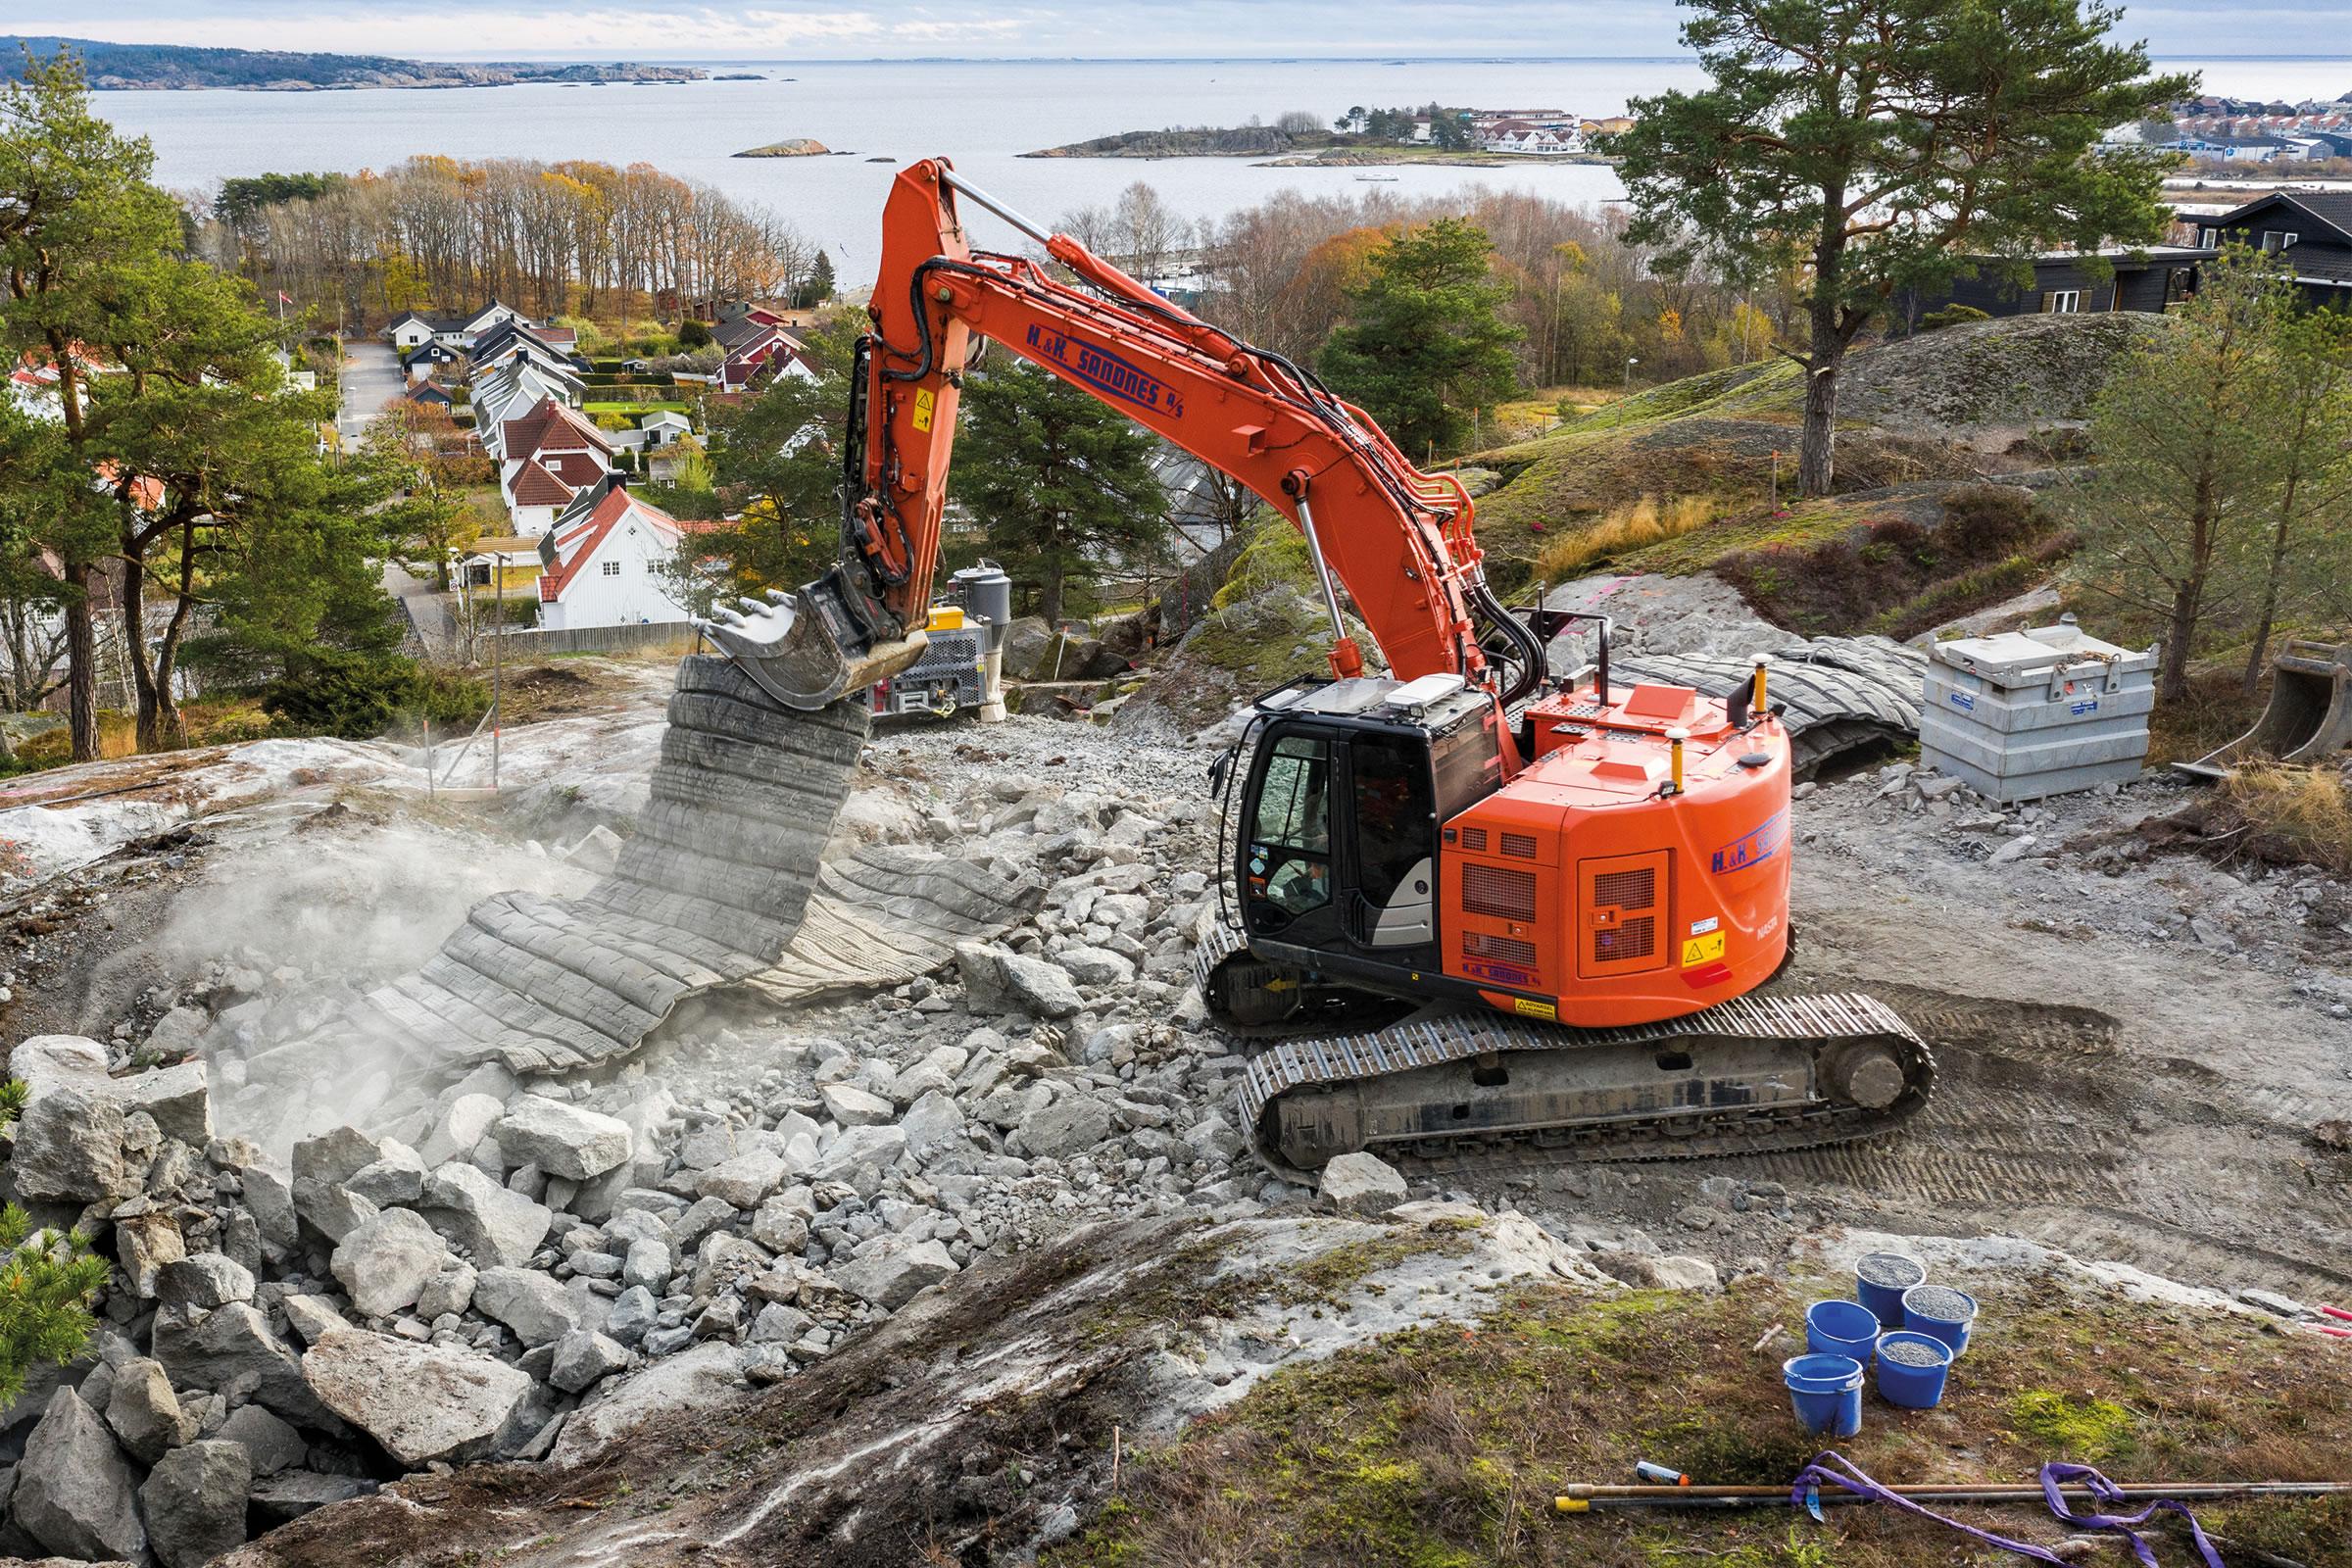 Hitachi excavator on site in Norway